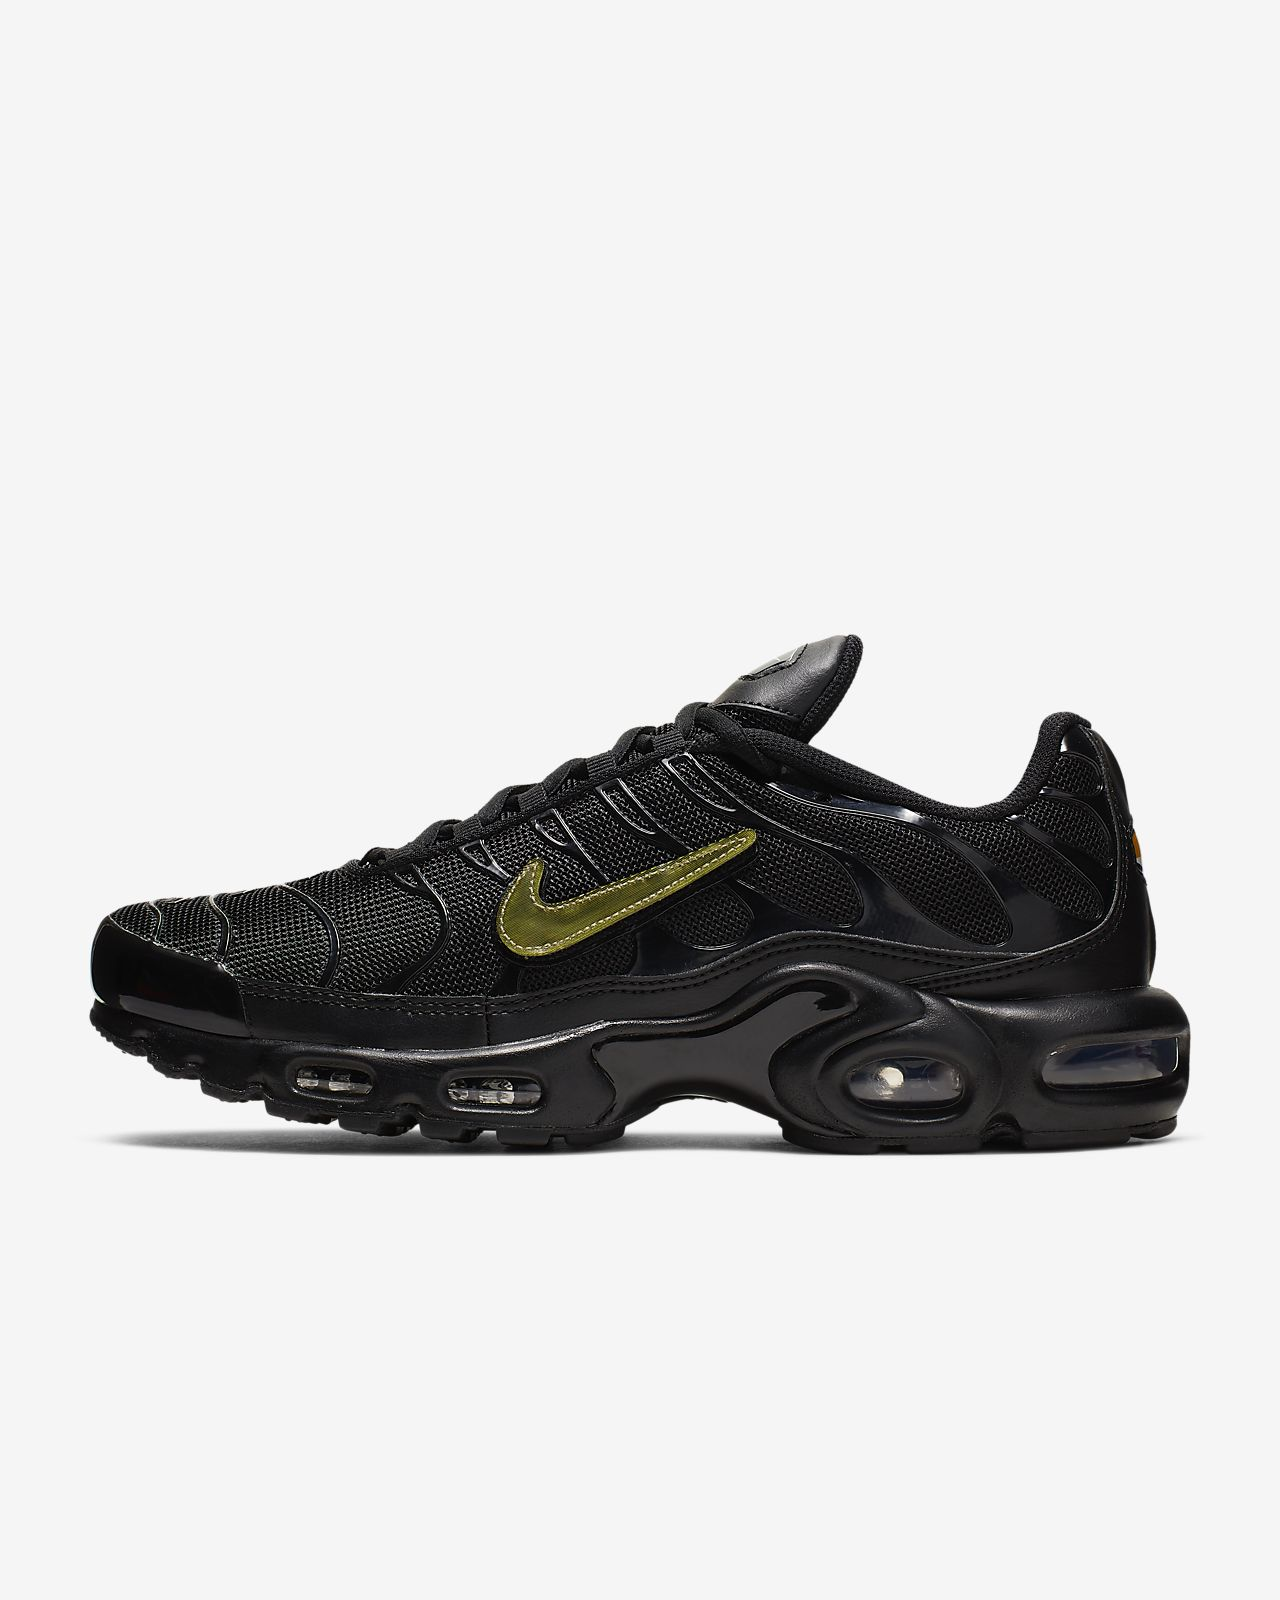 Nike air max plus Nike air max plus | Sneakers fashion, Shoes